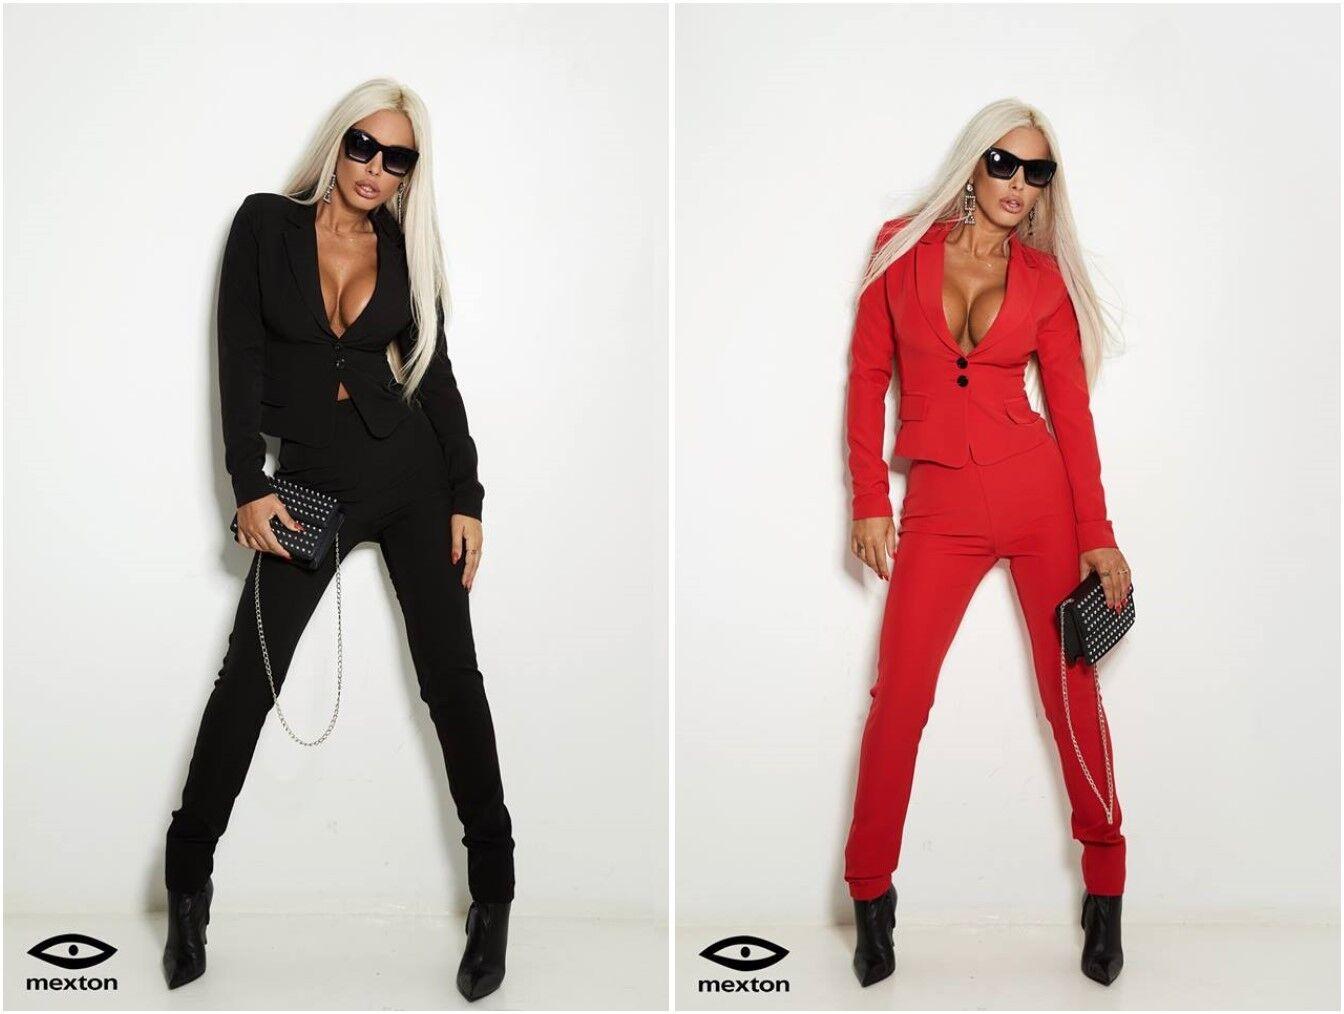 d5385befc11d Mexton Donna 2 divisori Blaser con Pantaloni Pantaloni Pantaloni  completamente rosso o nero 34